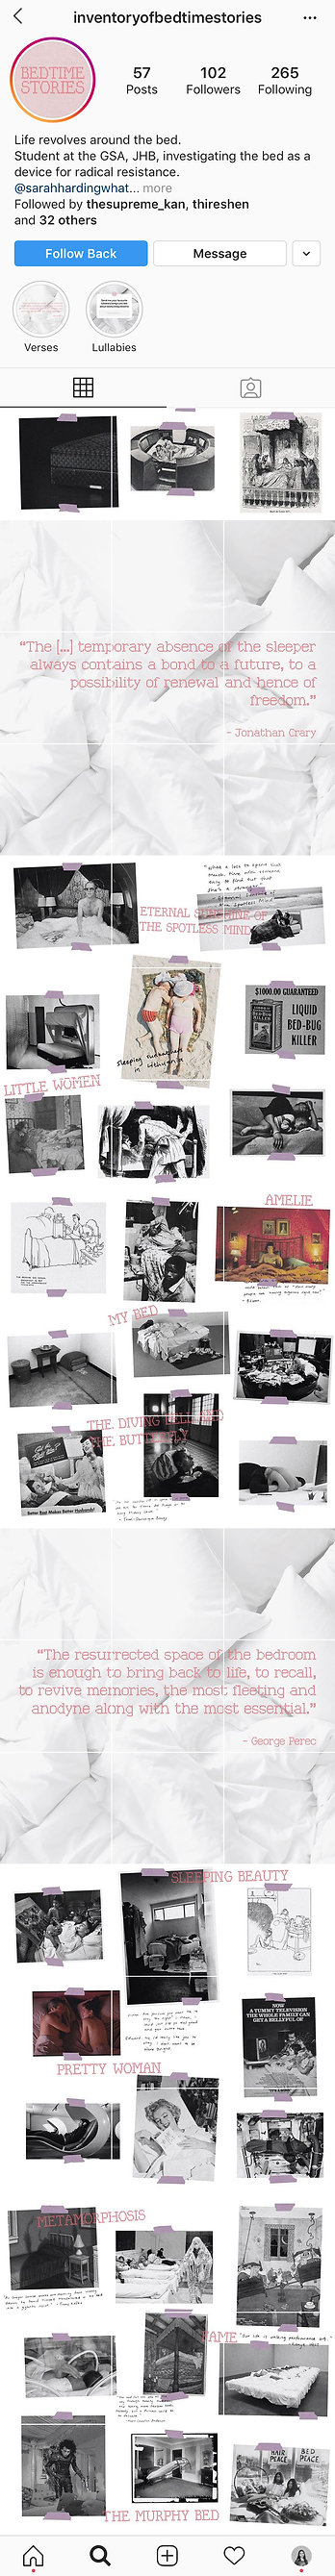 Sarah Bedtime stories IG.jpg